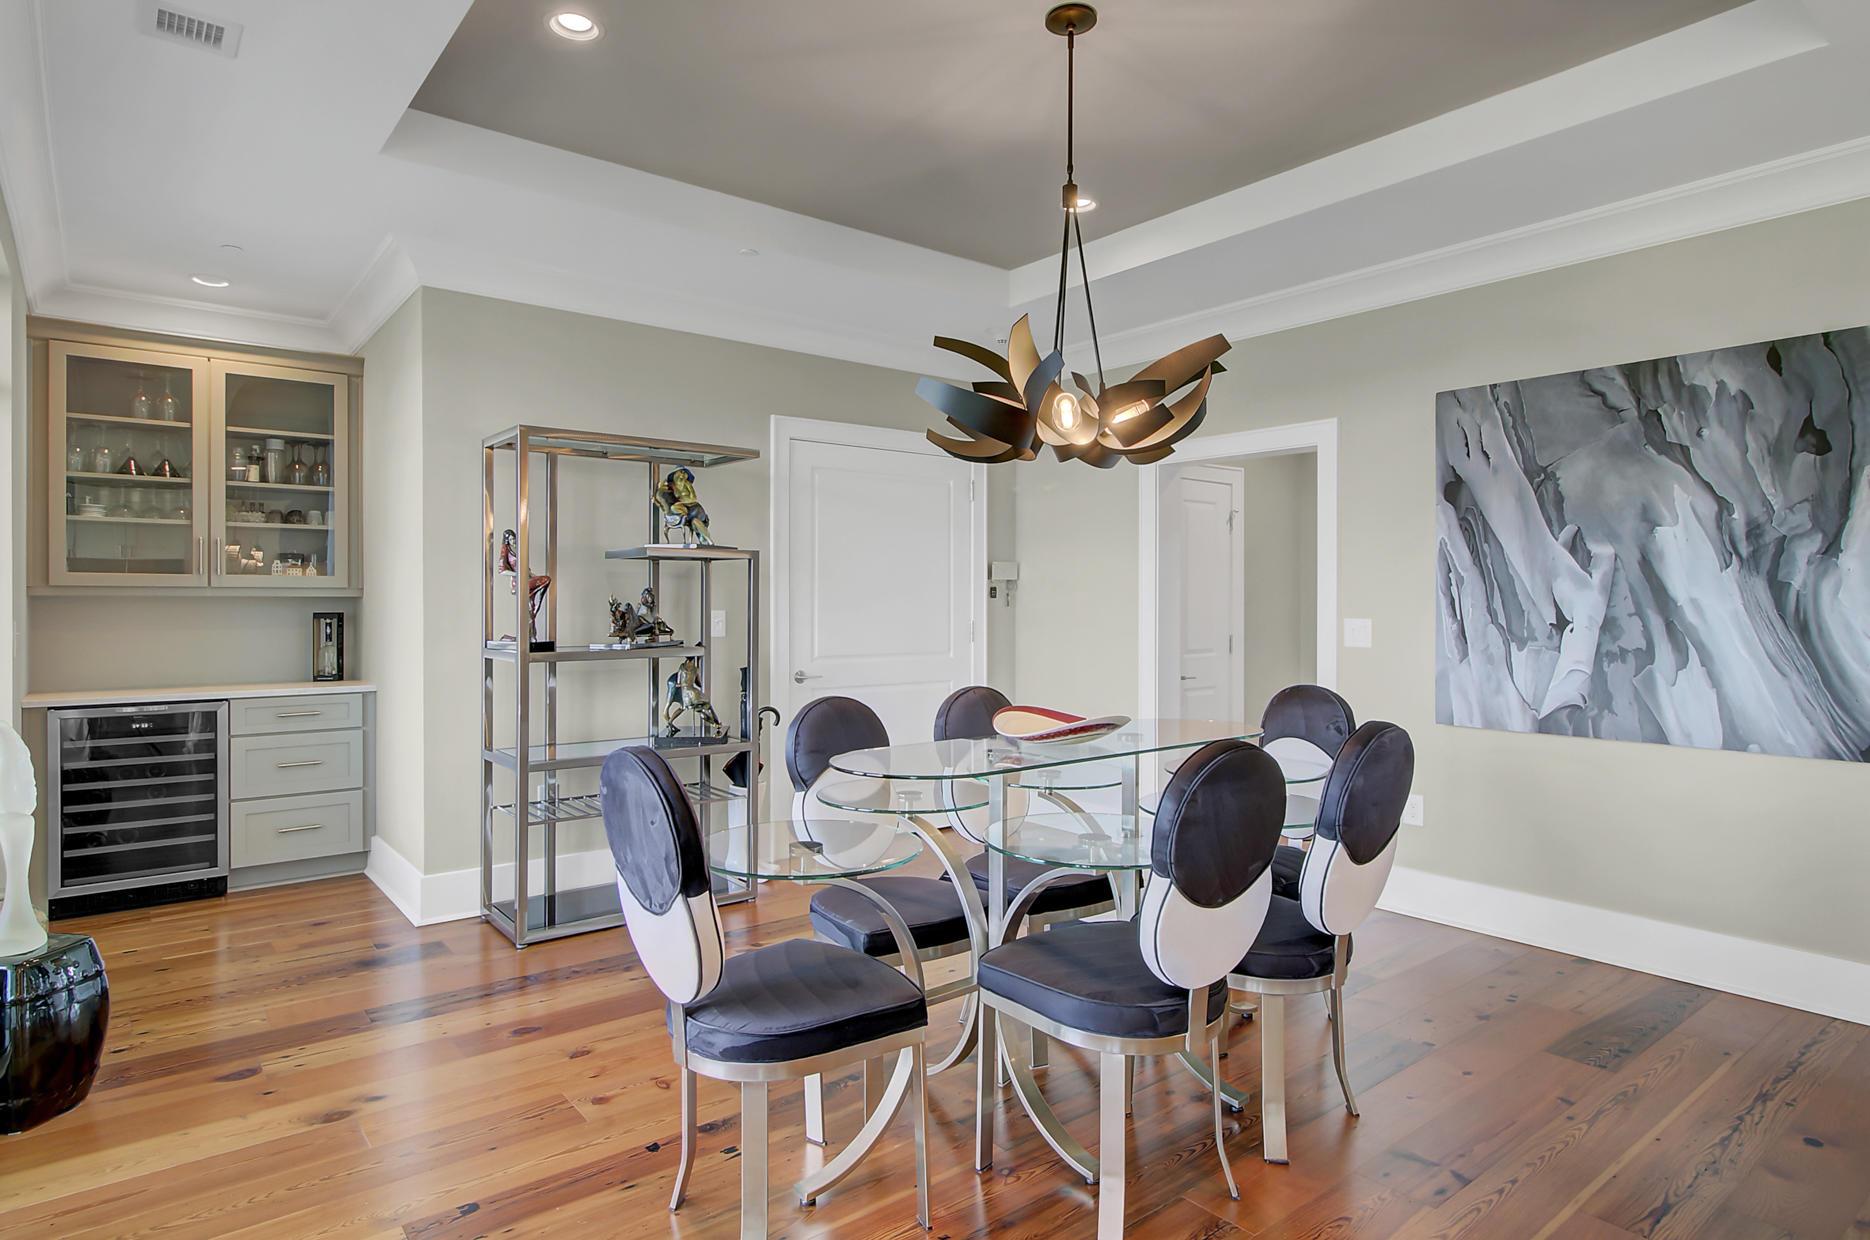 Tides IV Condominiums Homes For Sale - 155 Wingo Way, Mount Pleasant, SC - 3